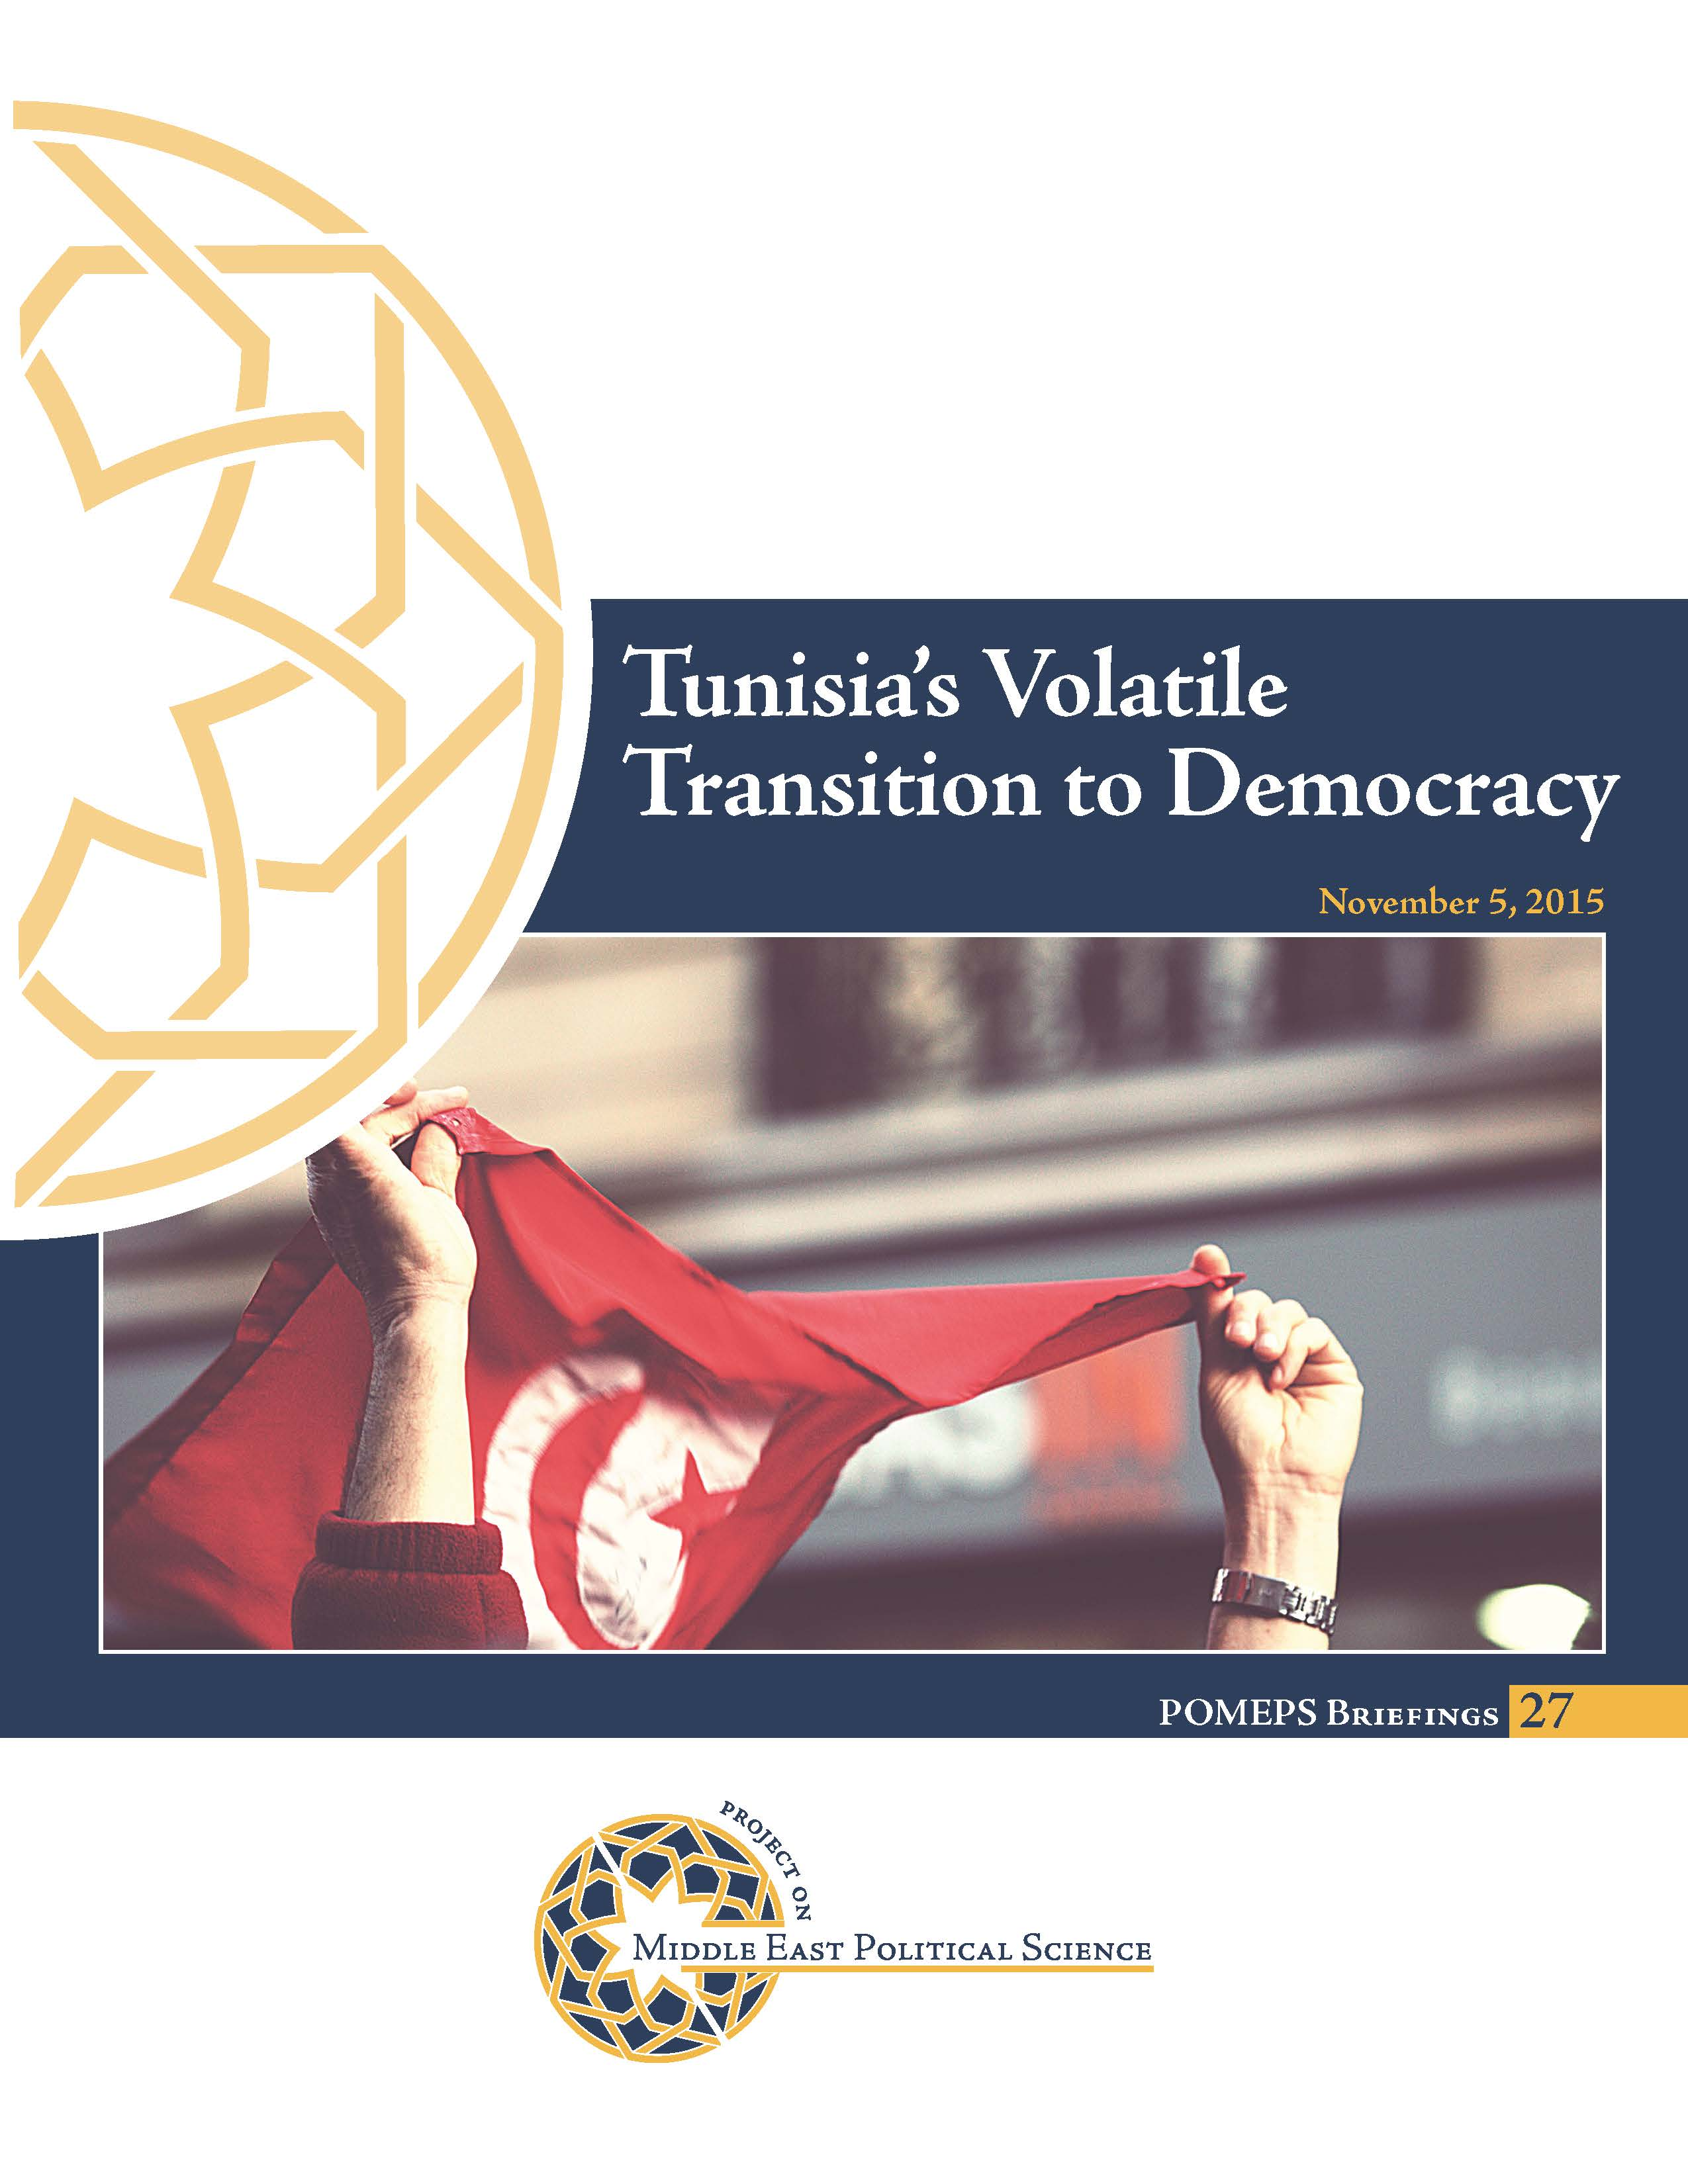 Tunisia's Volatile Transition to Democracy